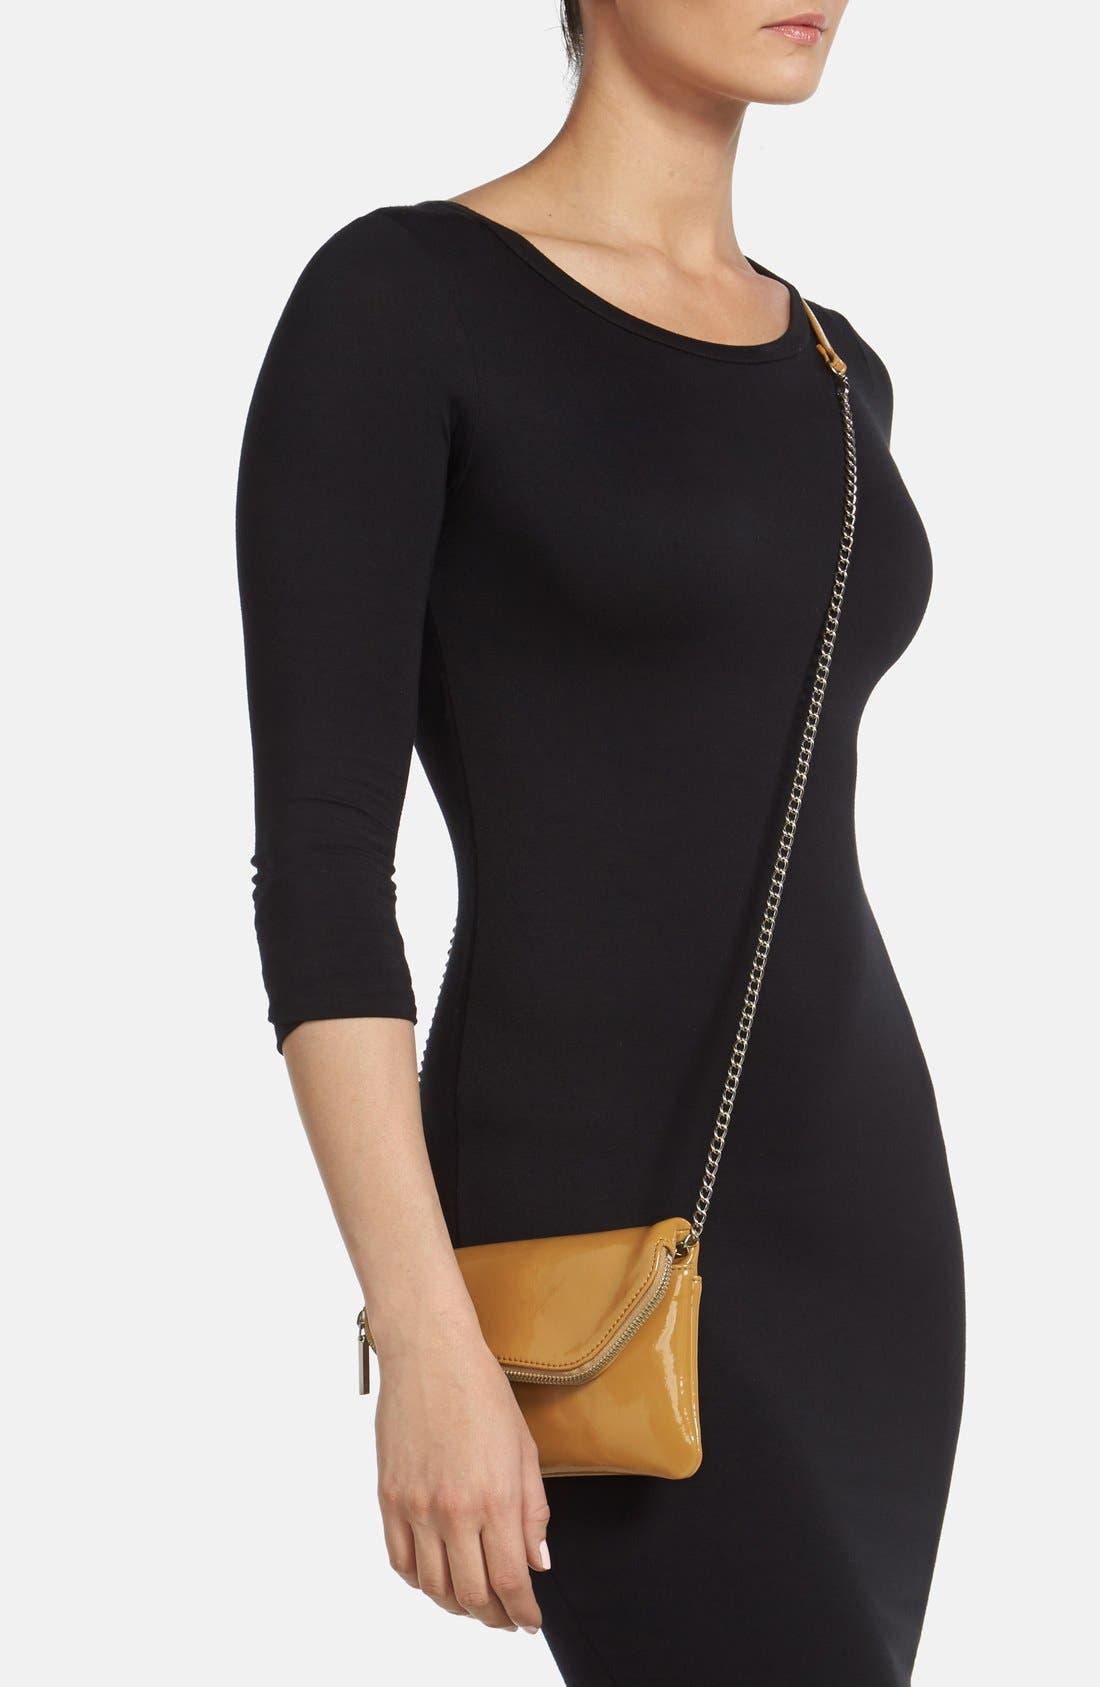 Alternate Image 2  - Hobo 'Daria' Patent Leather Crossbody